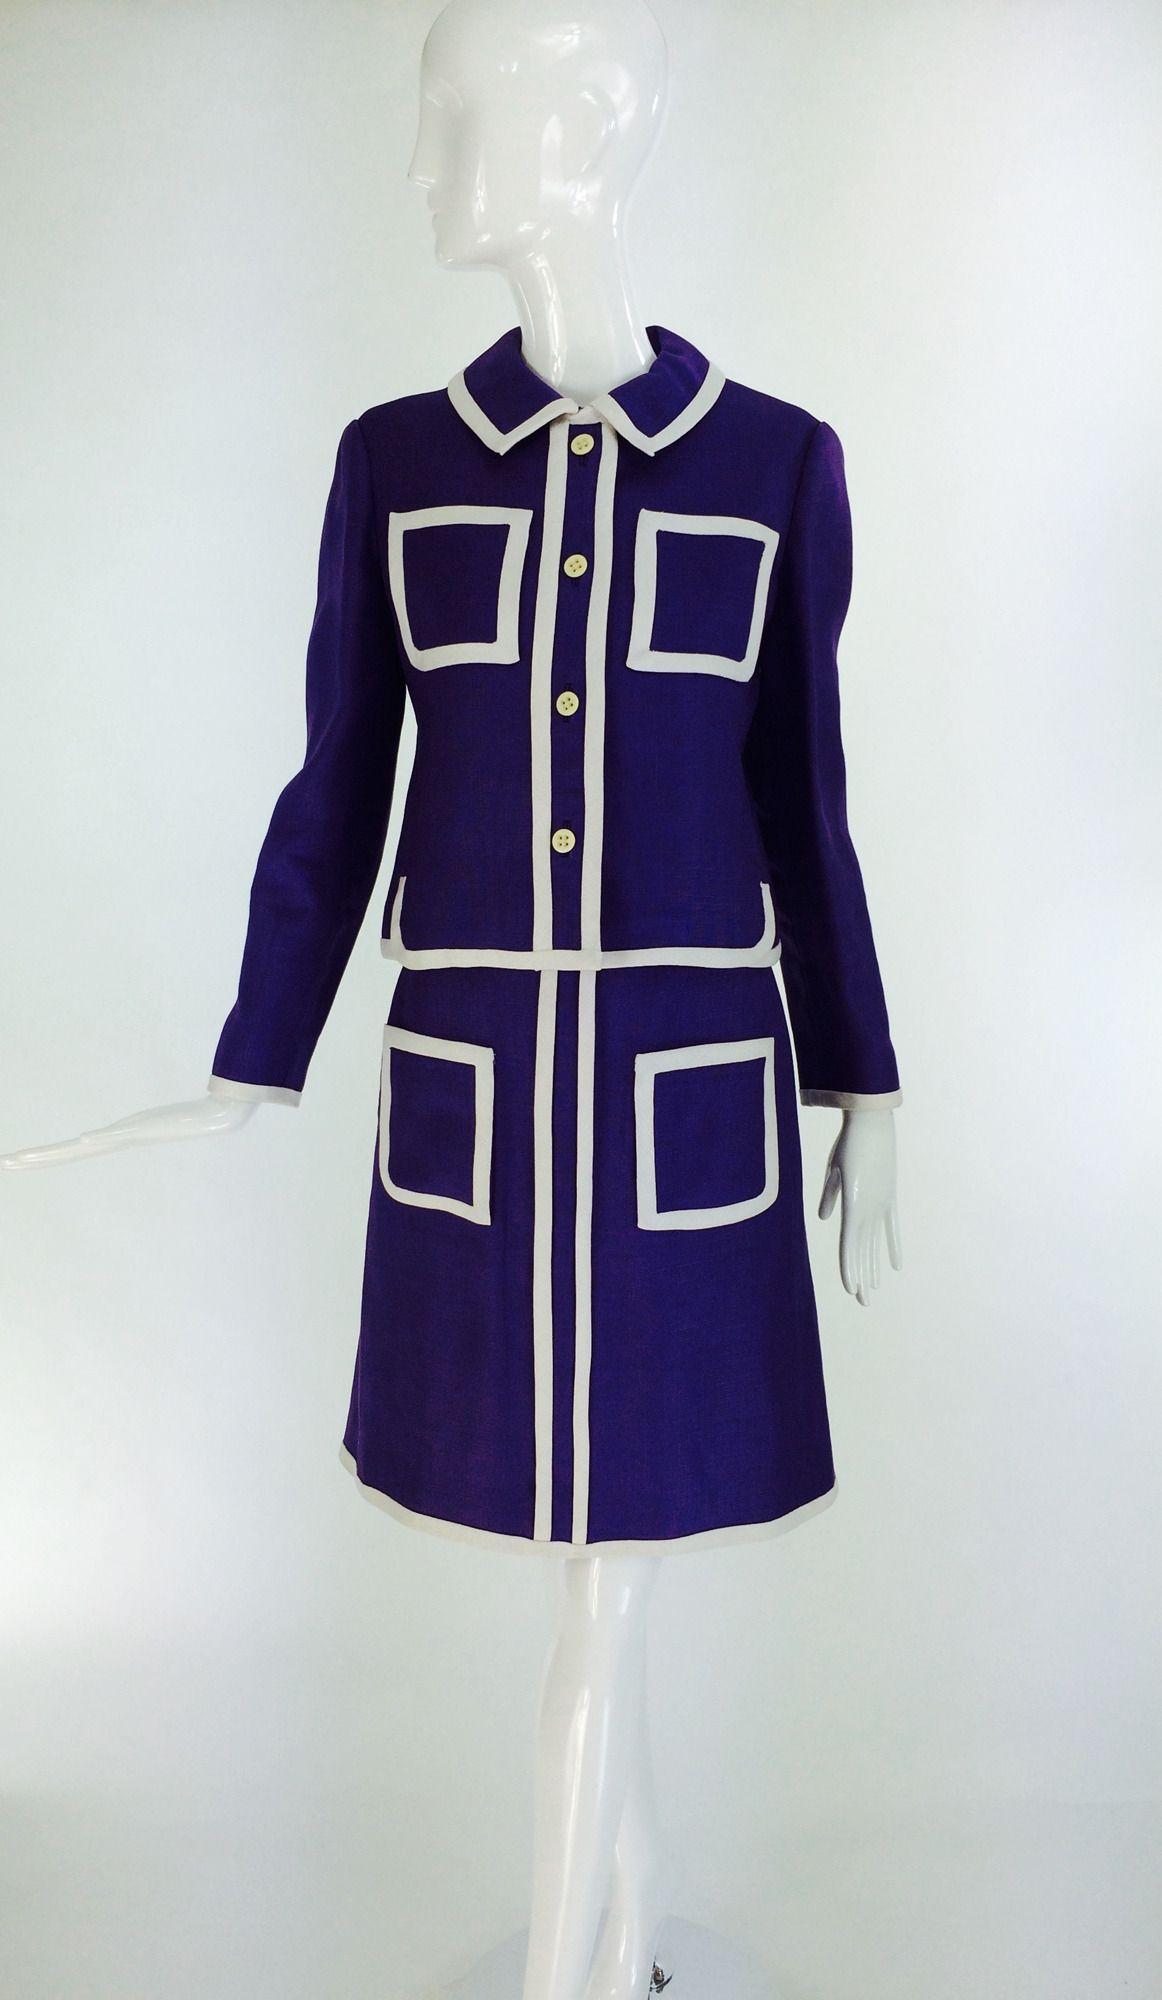 a7c13a2644264 Donald Brooks Mod 3 pc. skirt set in purple linen 1960s | 1960s ...